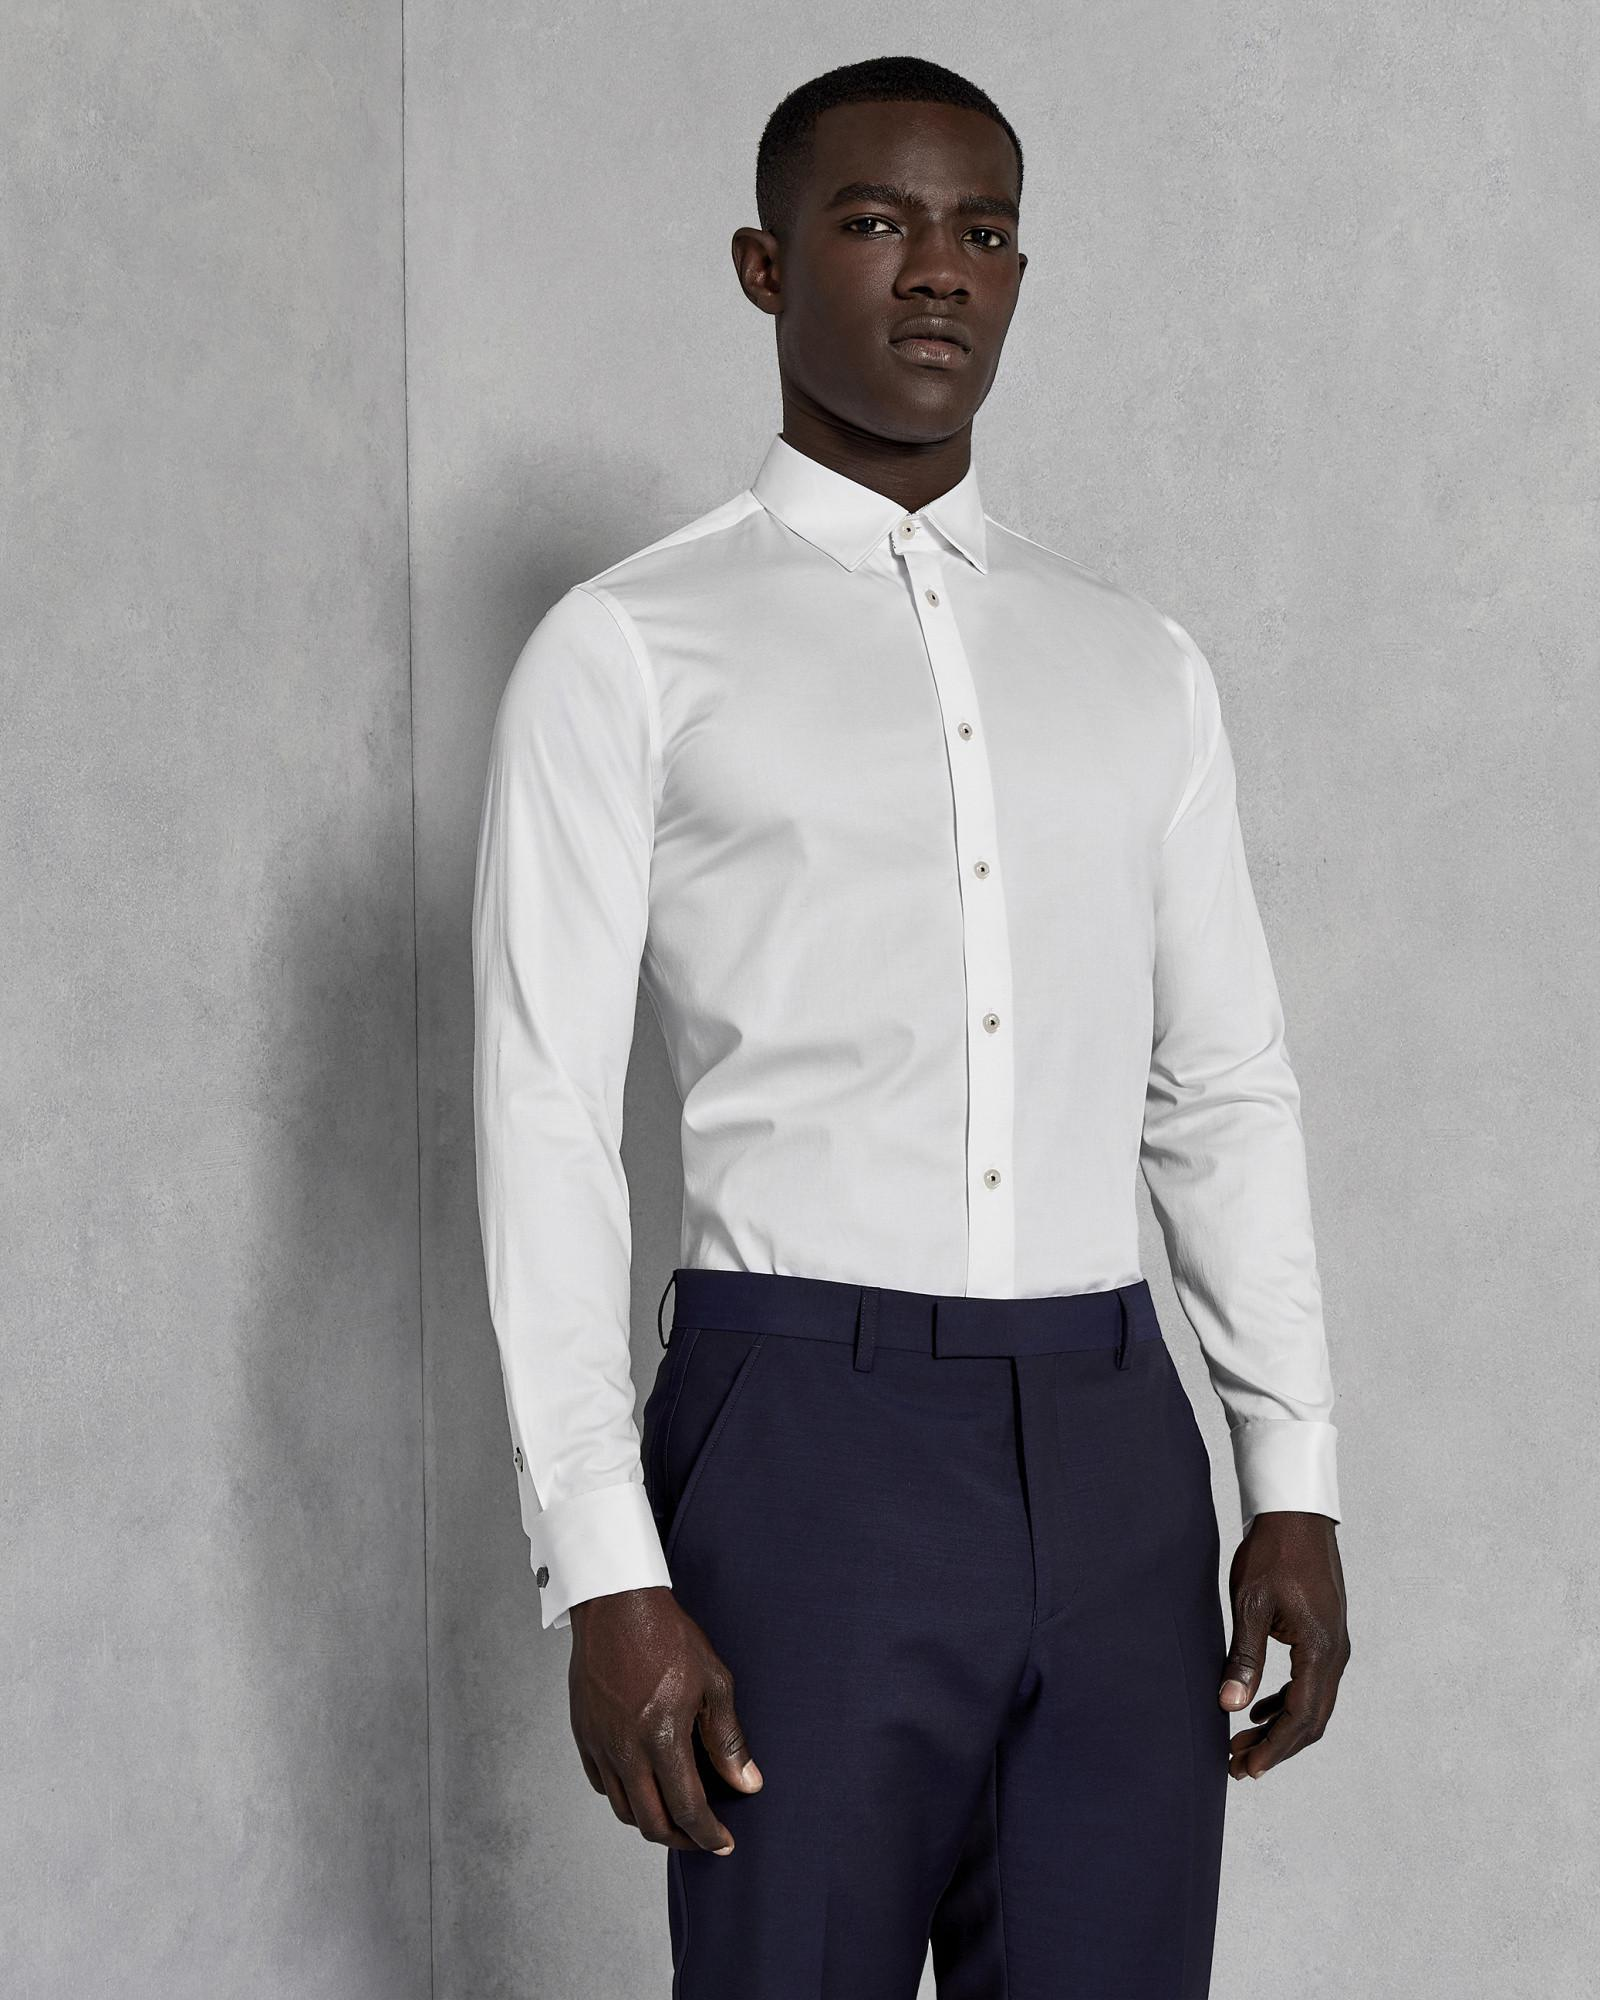 4d52d4ba46db8 Lyst - Ted Baker Classic Fit Plain Cotton Shirt in White for Men